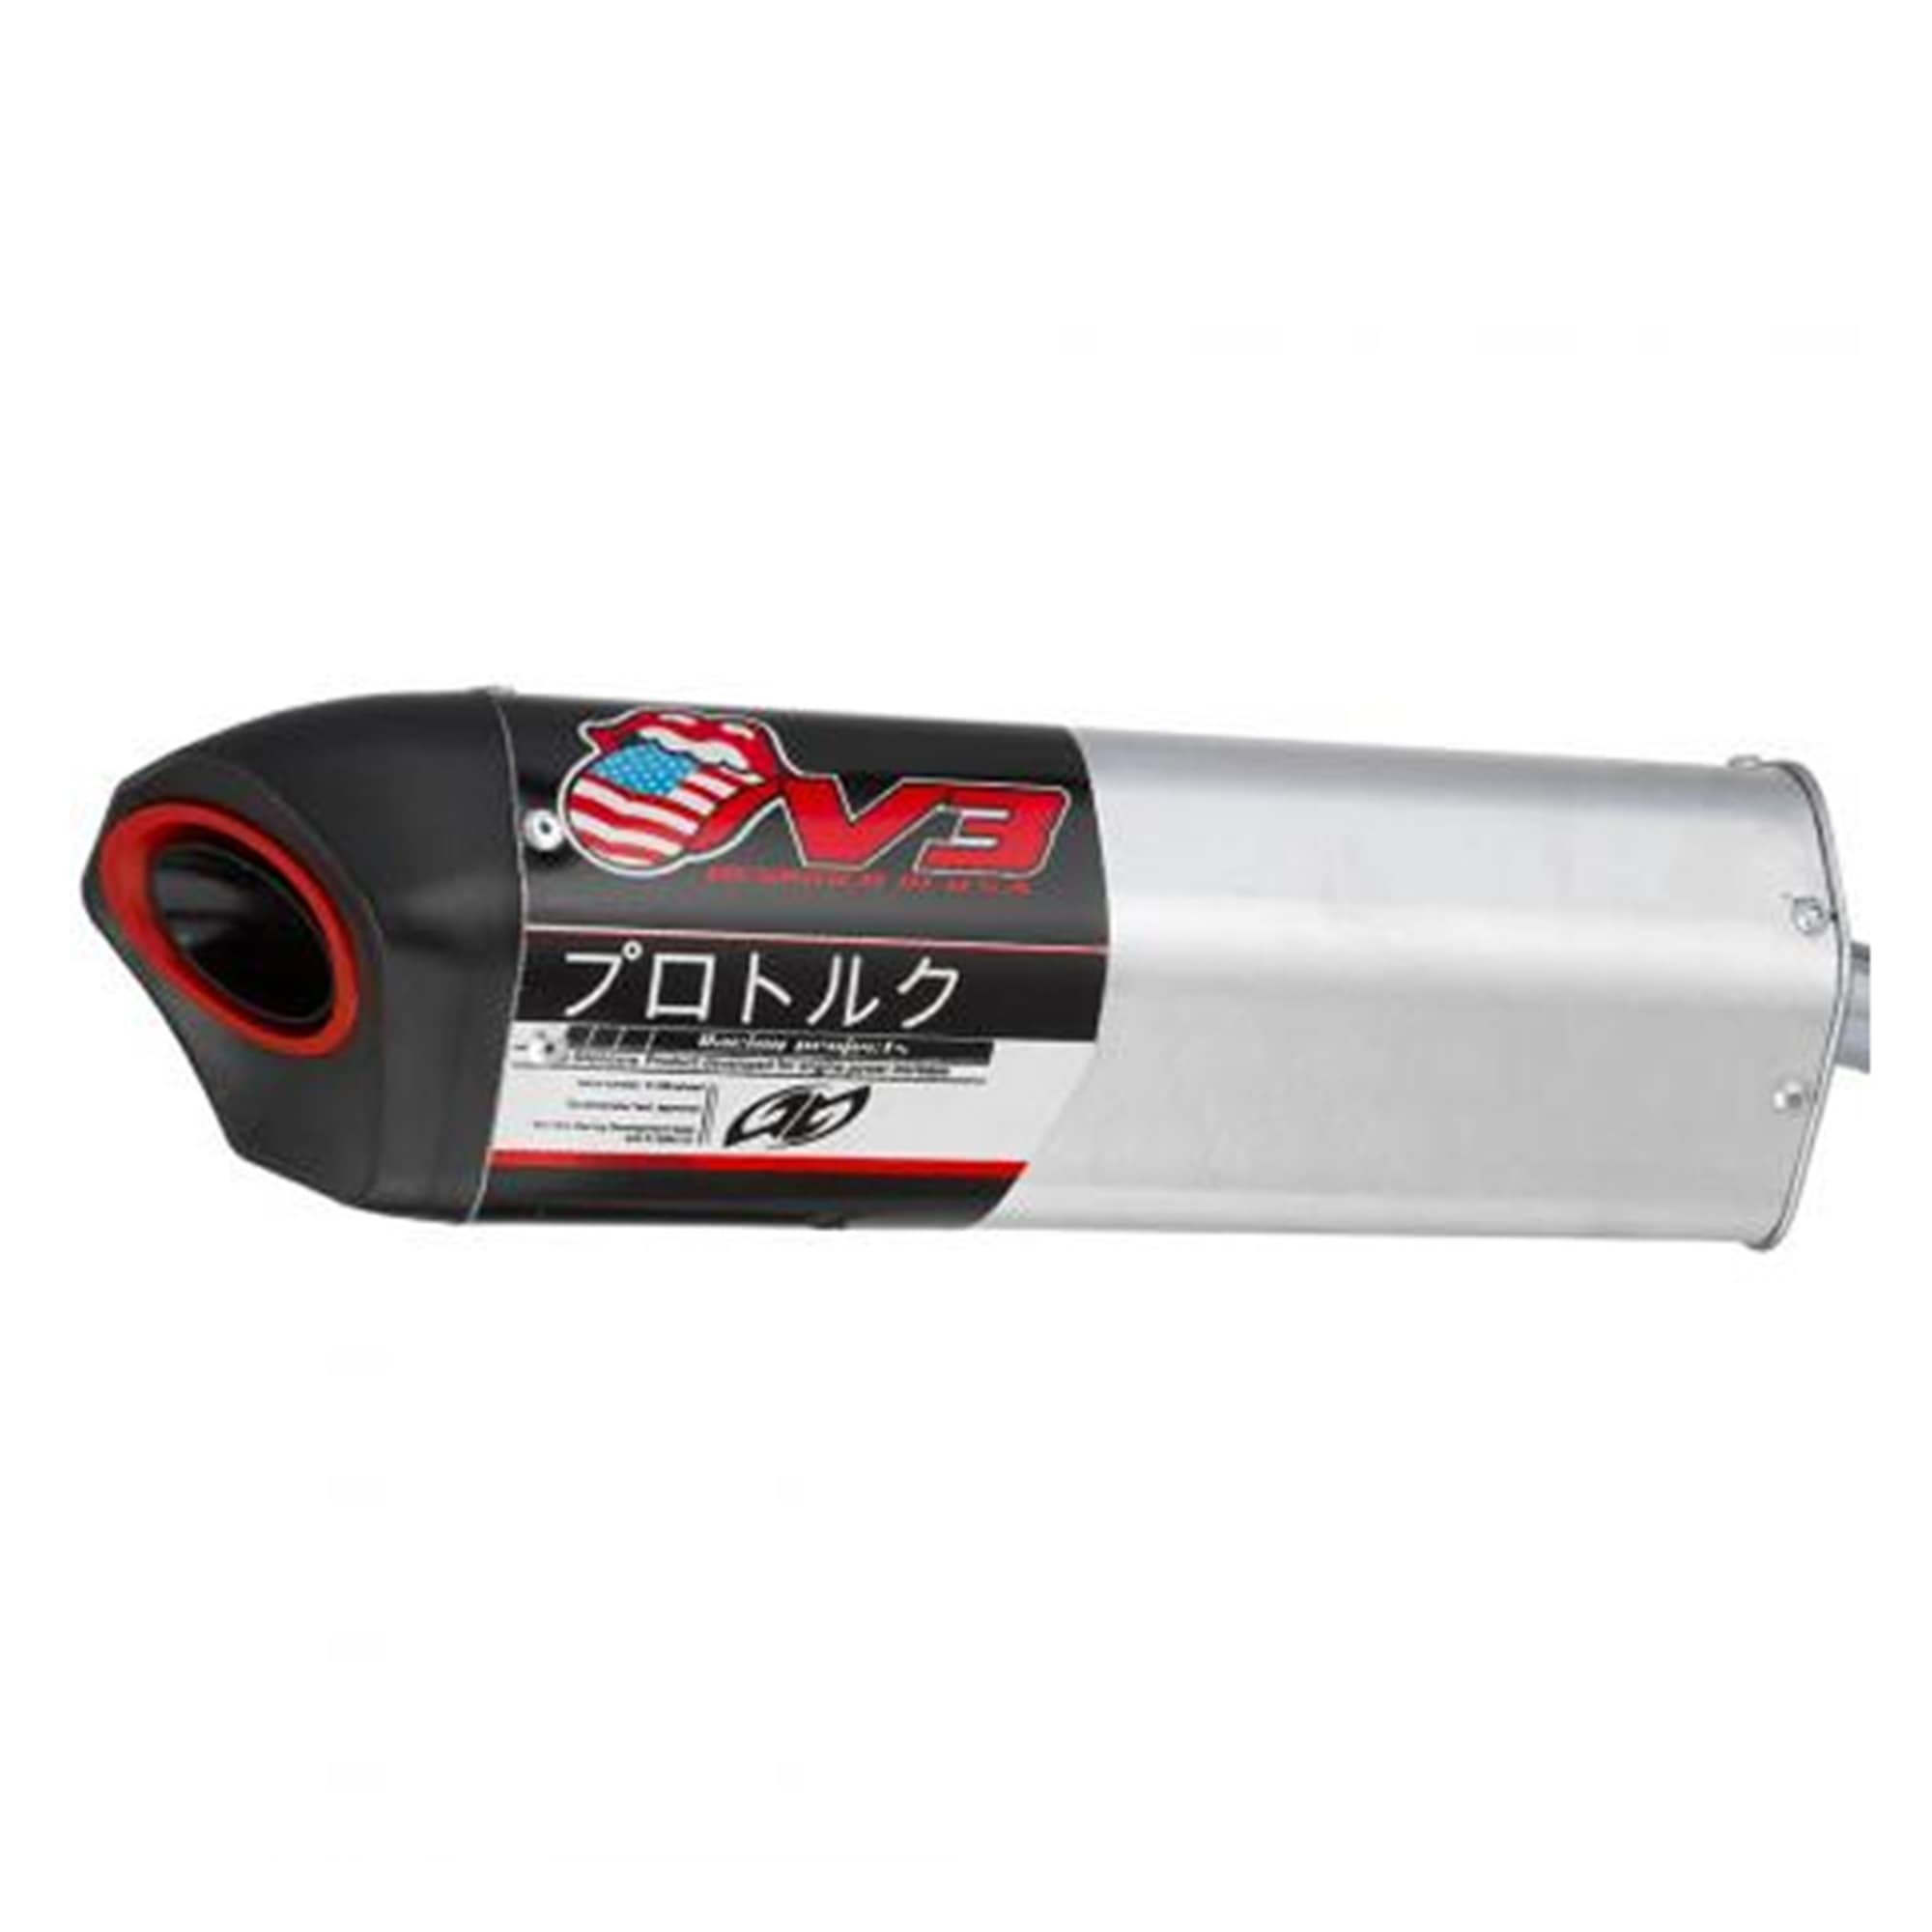 Ponteira Pro Tork V3 CRF 230  - HP Race Off Road